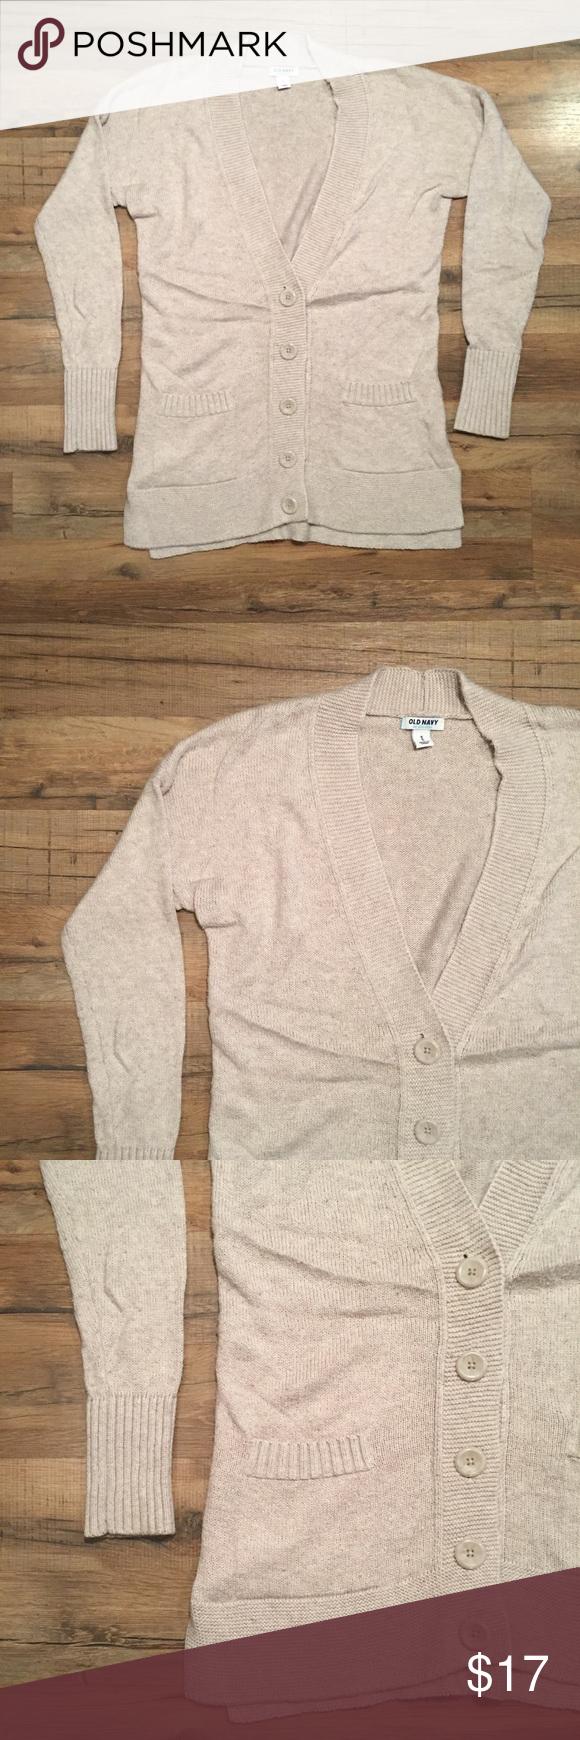 Old Navy cream wheat boyfriend cardigan sweater M This Old Navy ...